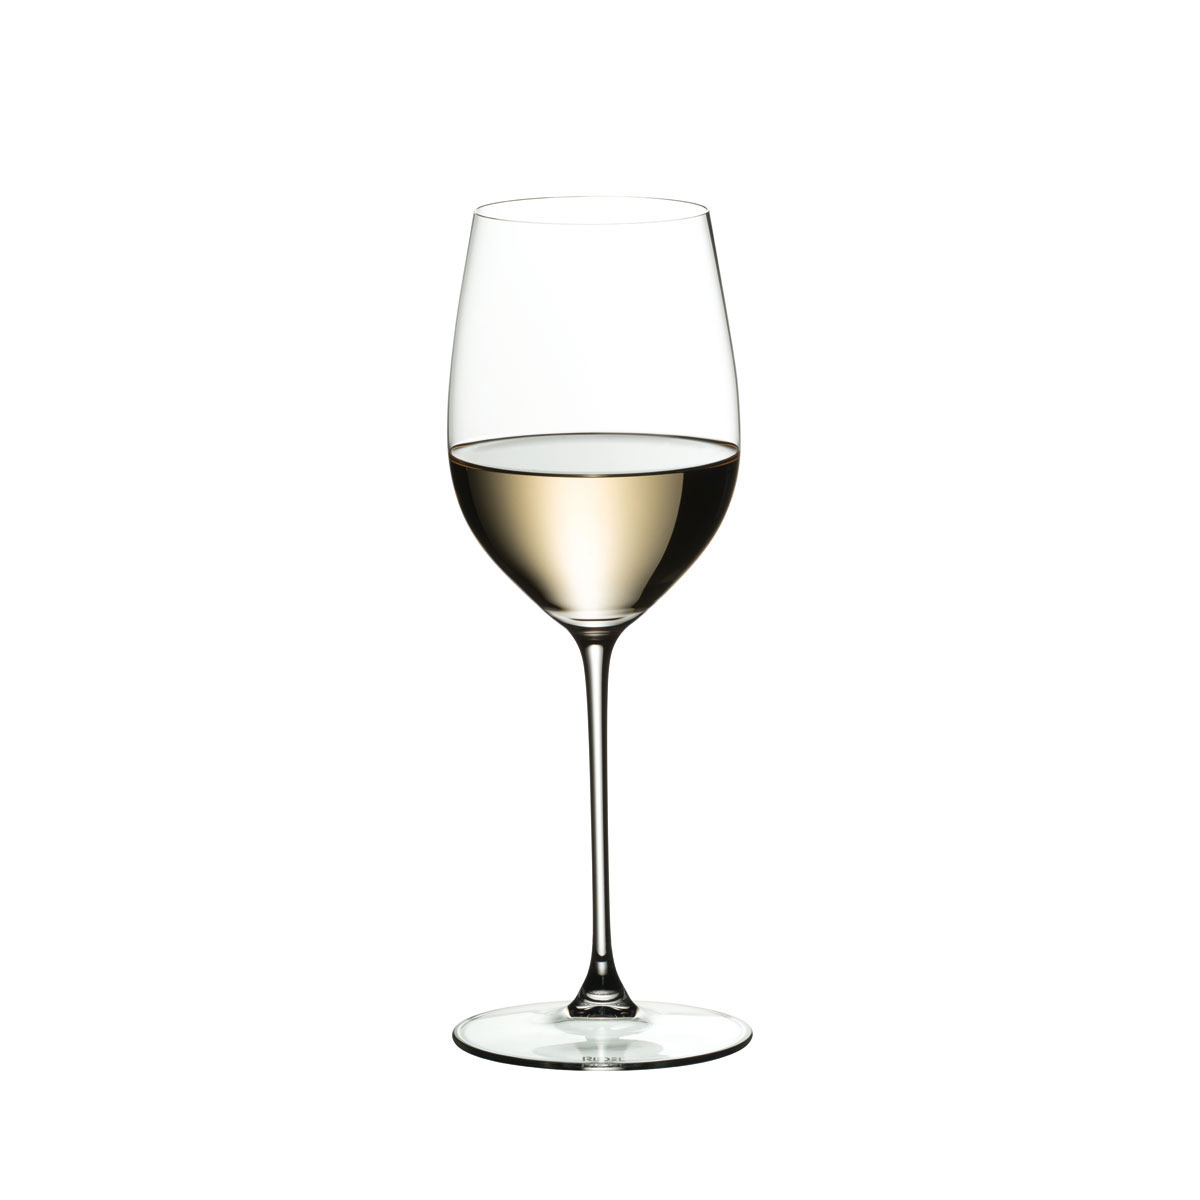 Riedel Veritas, Viognier, Chardonnay Crystal Wine Glass, Single